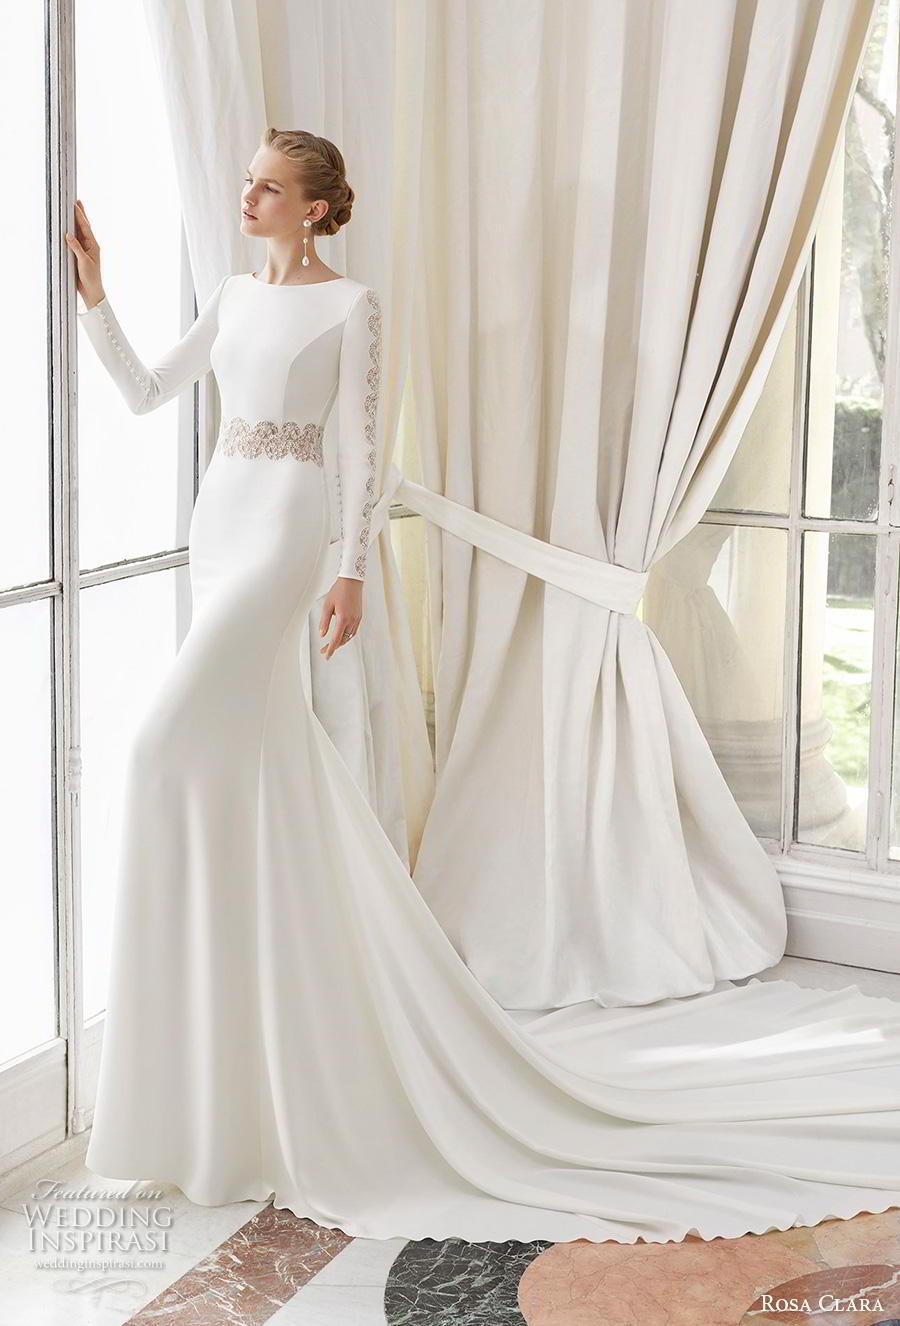 rosa clara 2019 couture bridal long sleeves bateau neckline simple minimalist elegant fit and flare sheath wedding dress v back chapel train (7) mv